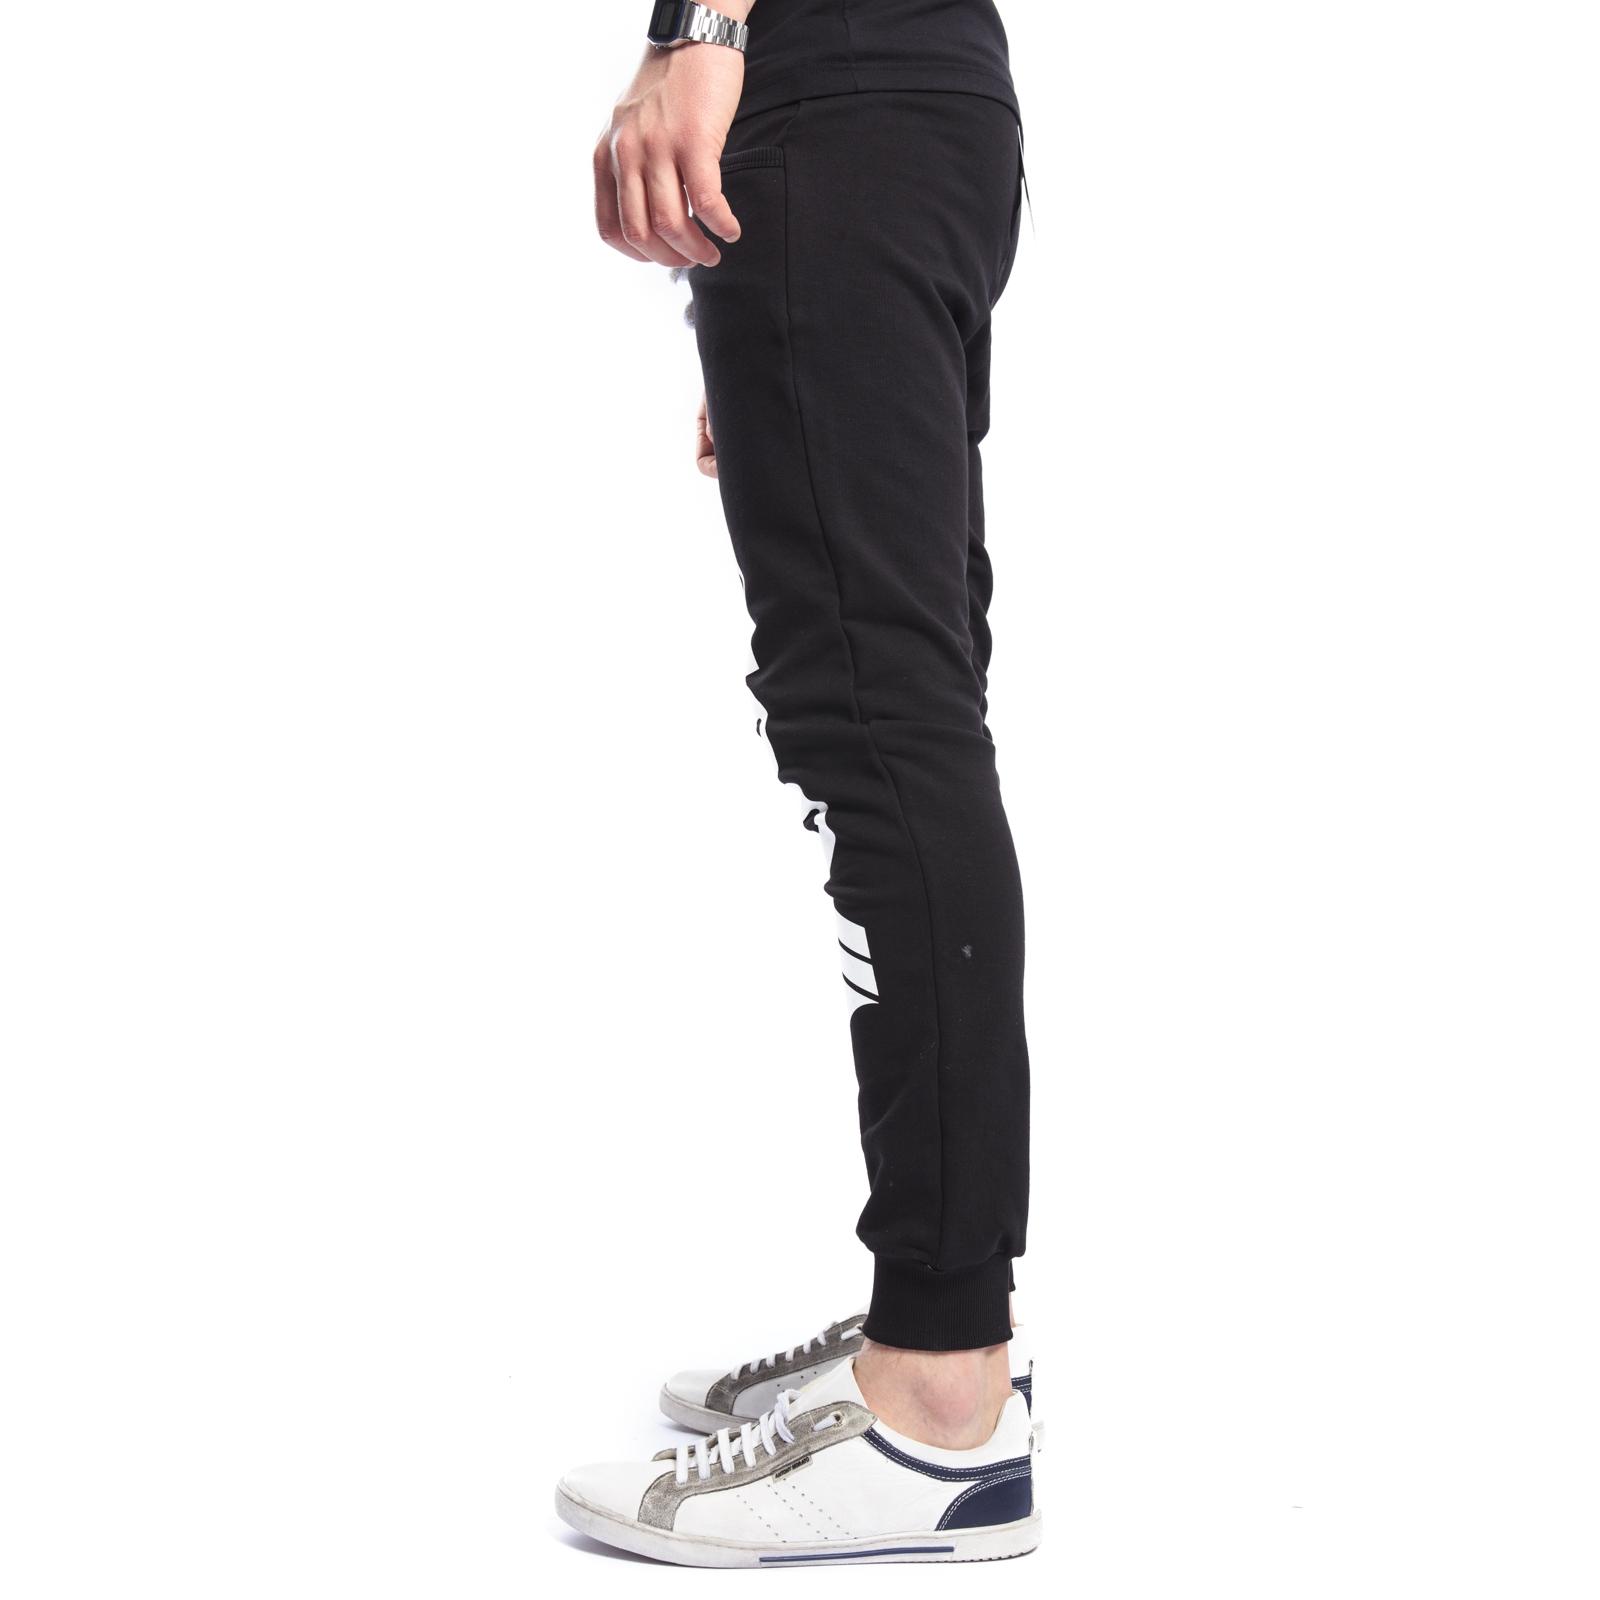 Felpa Stampa Pantaloni In Con Black Gola Gou306 dxorBeC